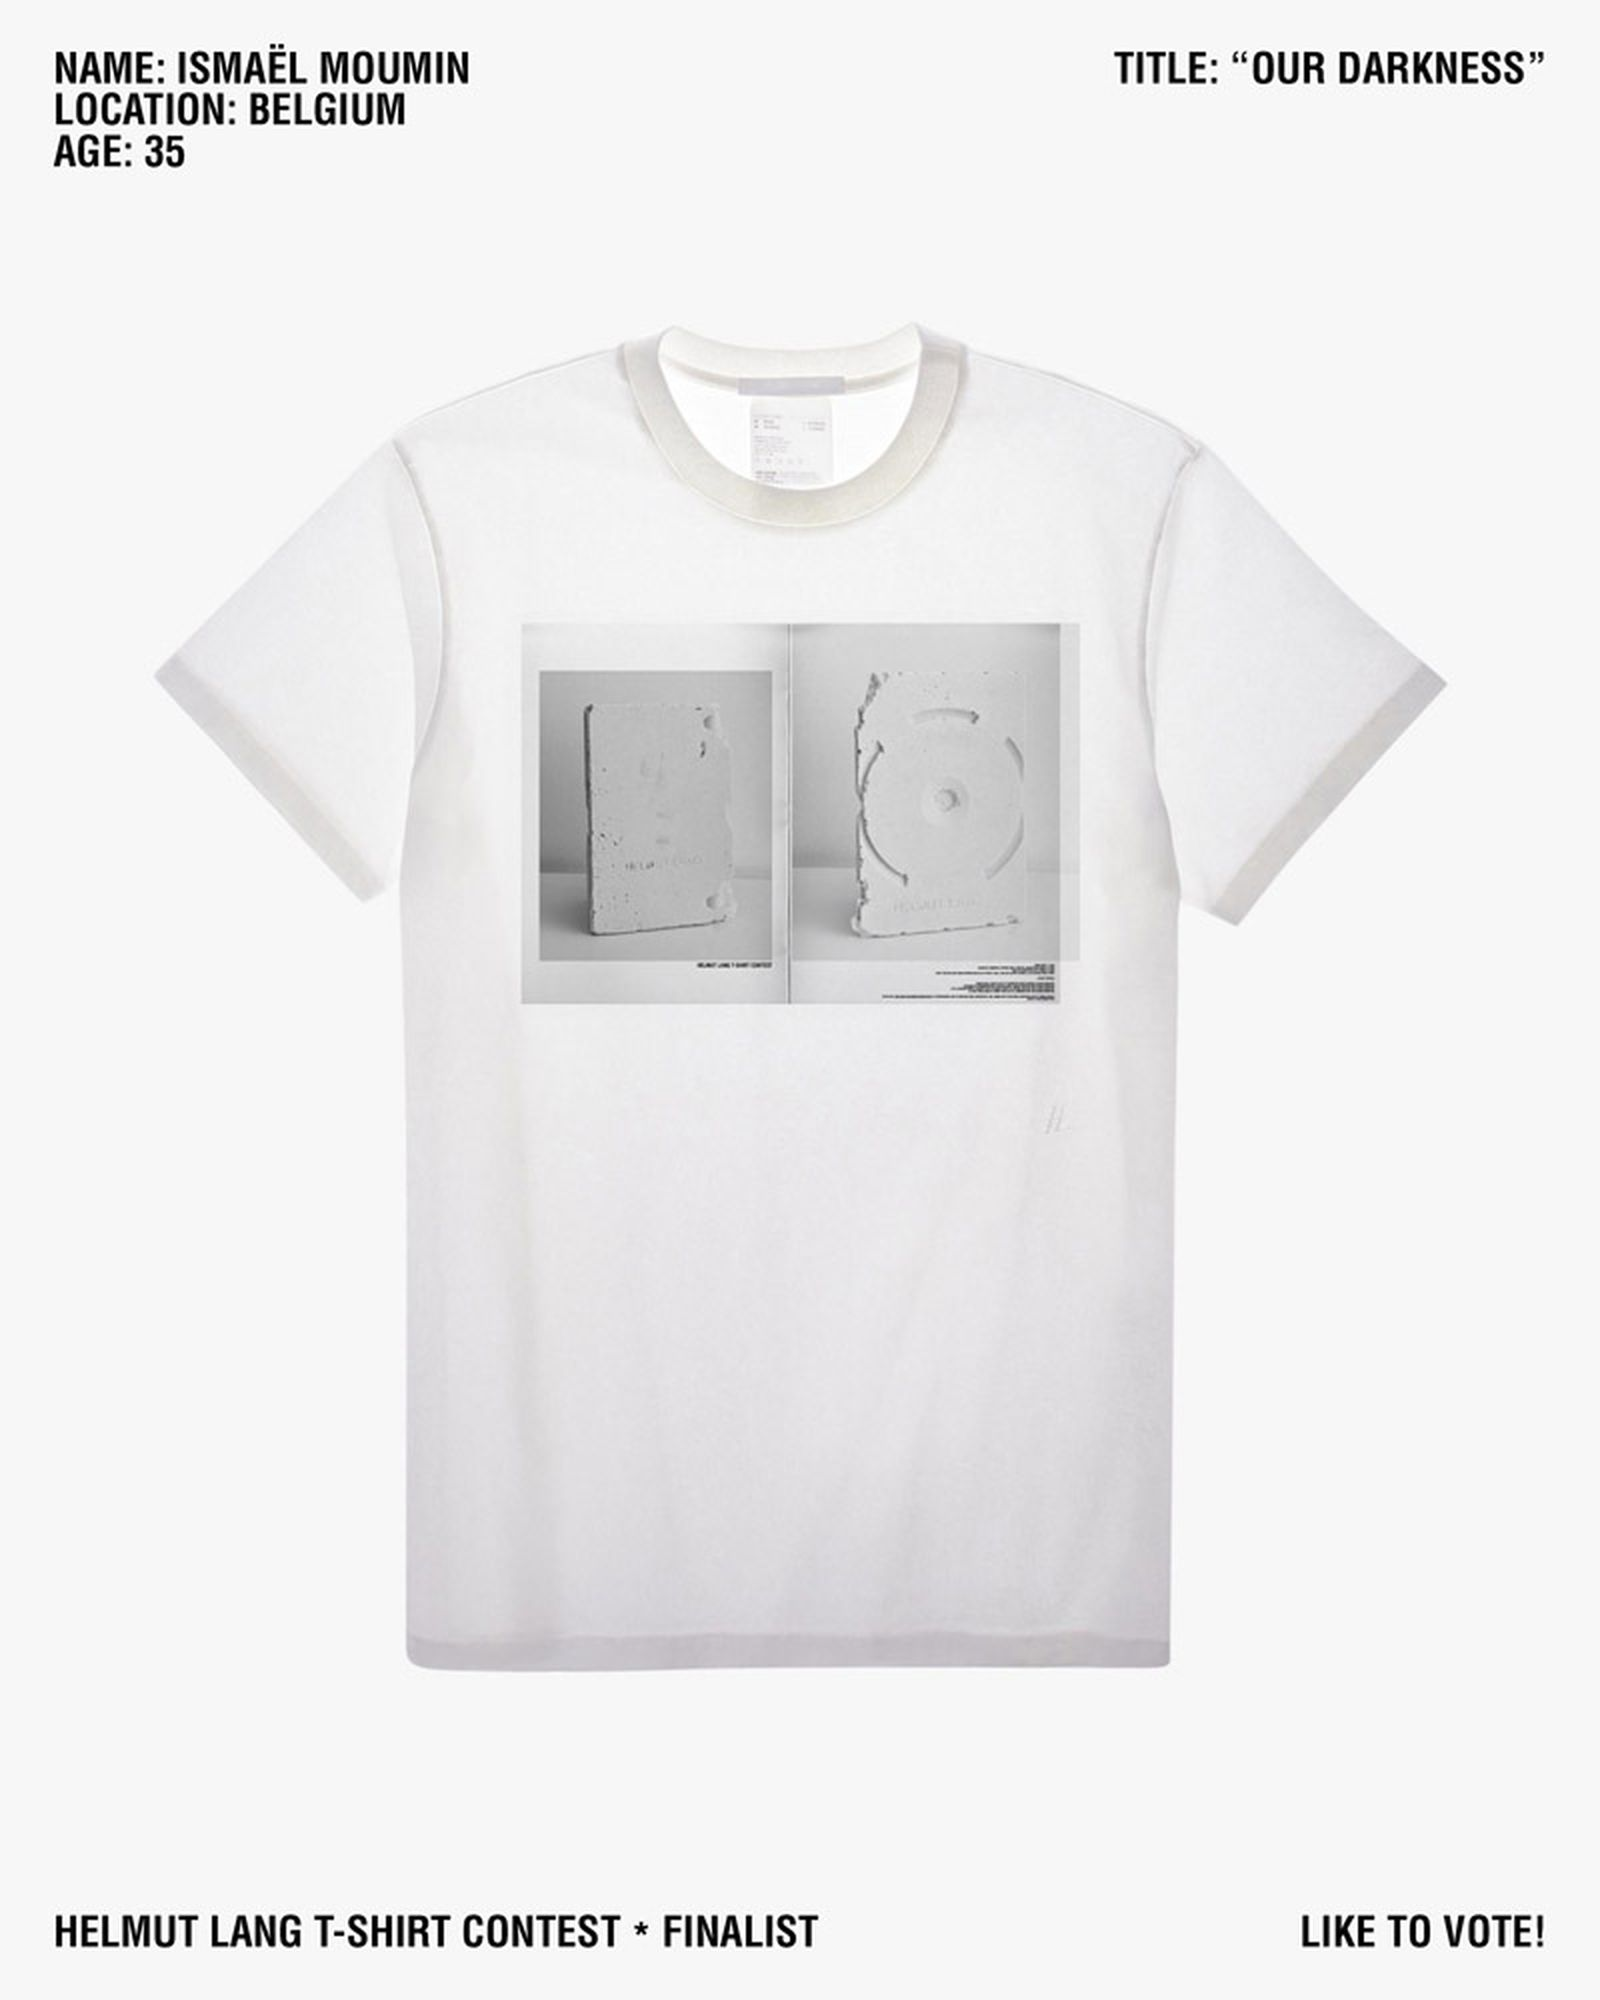 17helmut-lang-t-shirt-design-competition